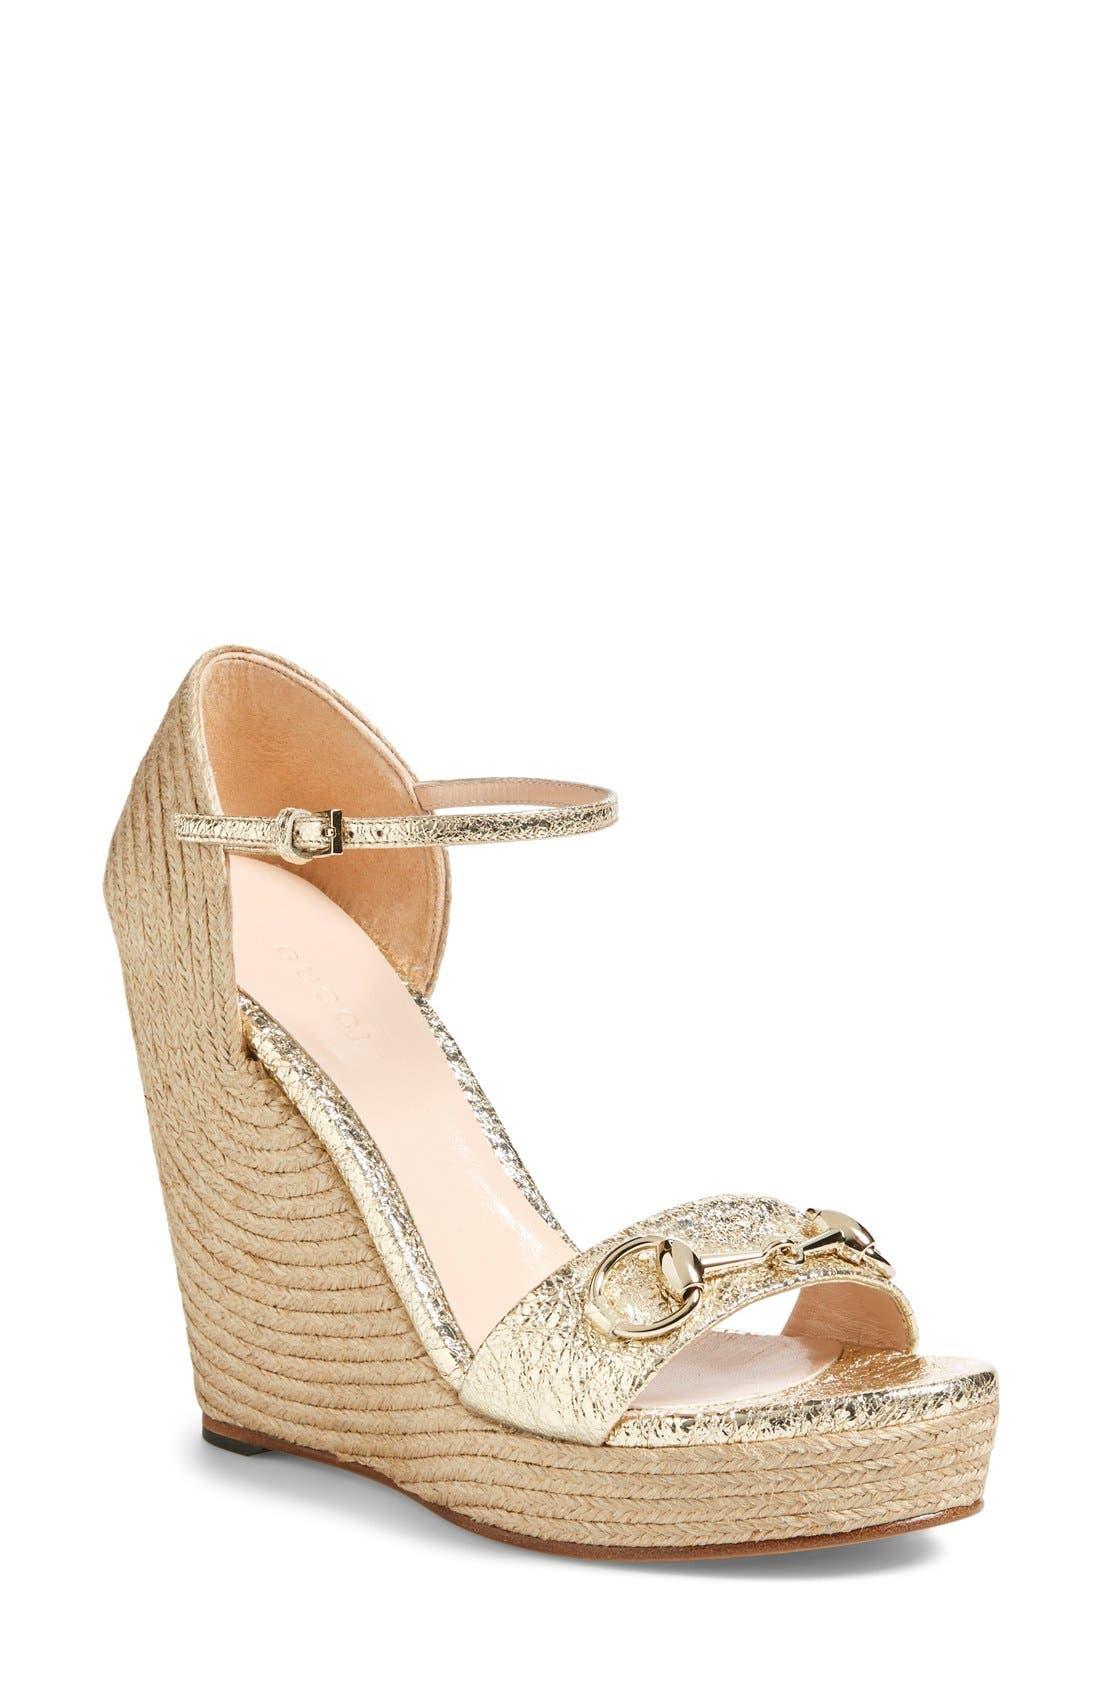 Alternate Image 1 Selected - Gucci 'Carolina' Wedge Sandal (Women)